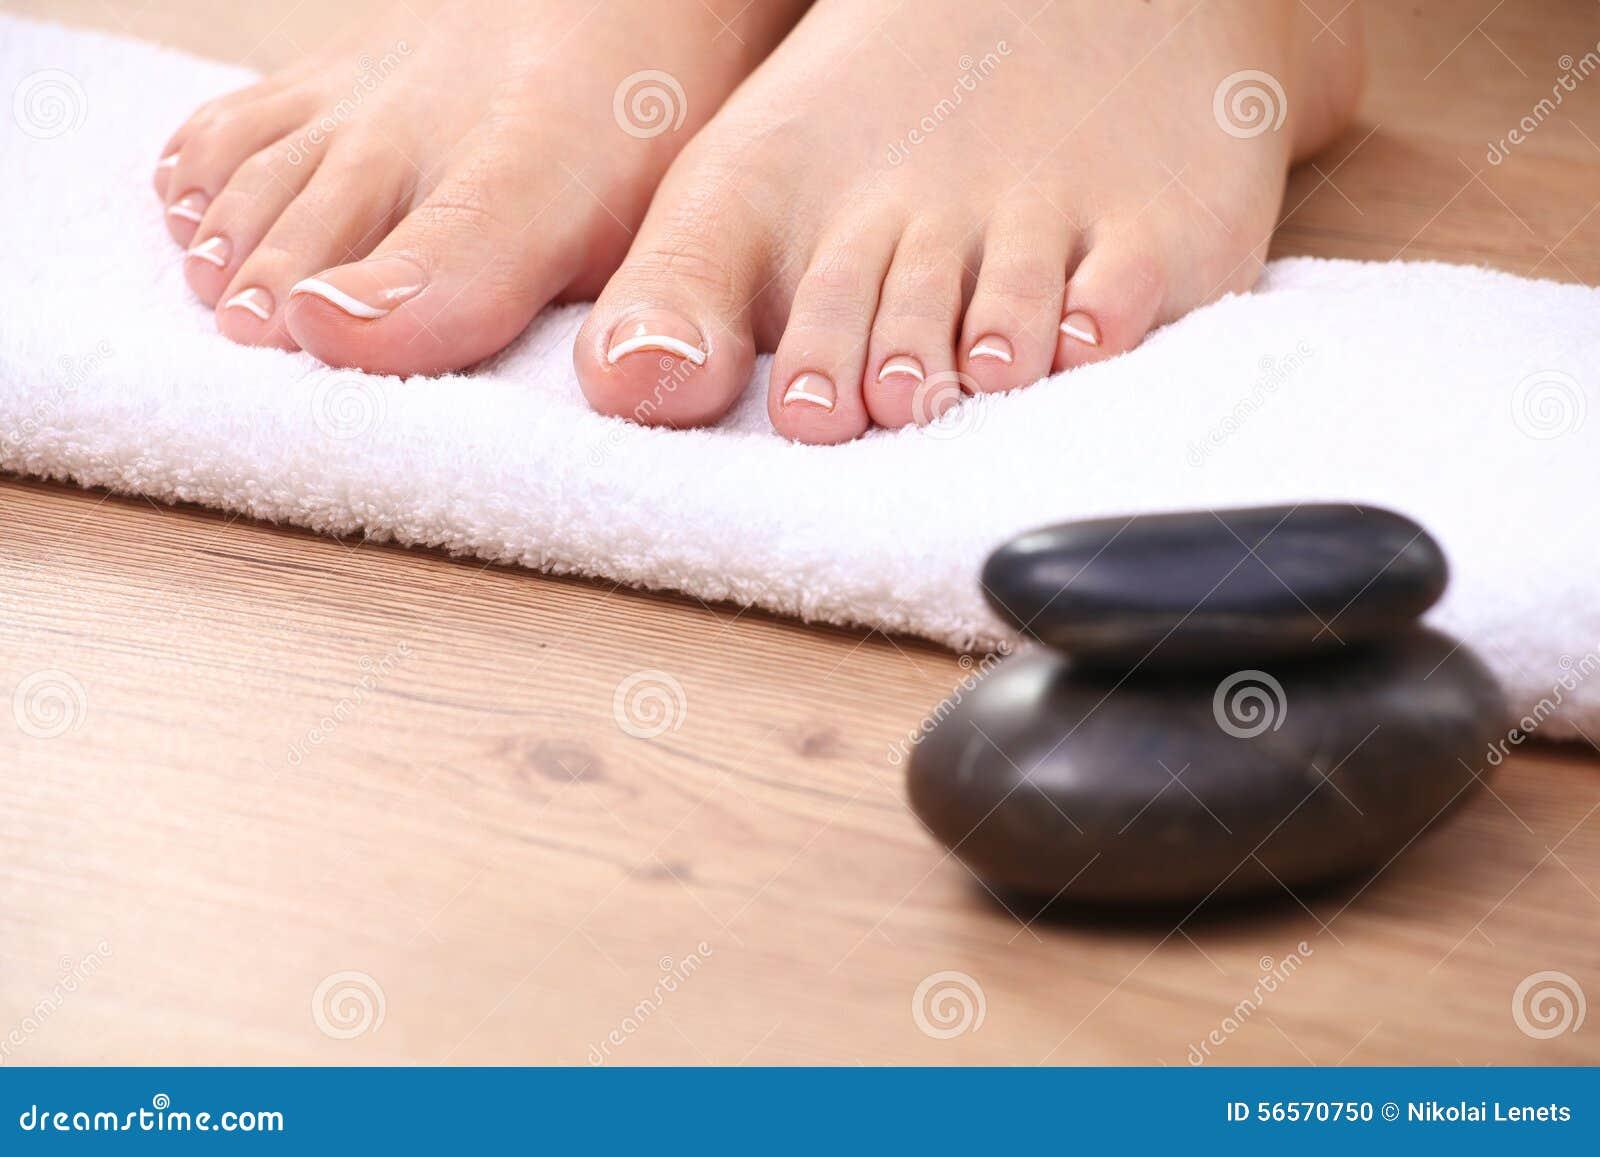 Download Όμορφα πόδια με το τέλειο γαλλικό καρφί SPA Στοκ Εικόνες - εικόνα από θηλυκός, πόδι: 56570750